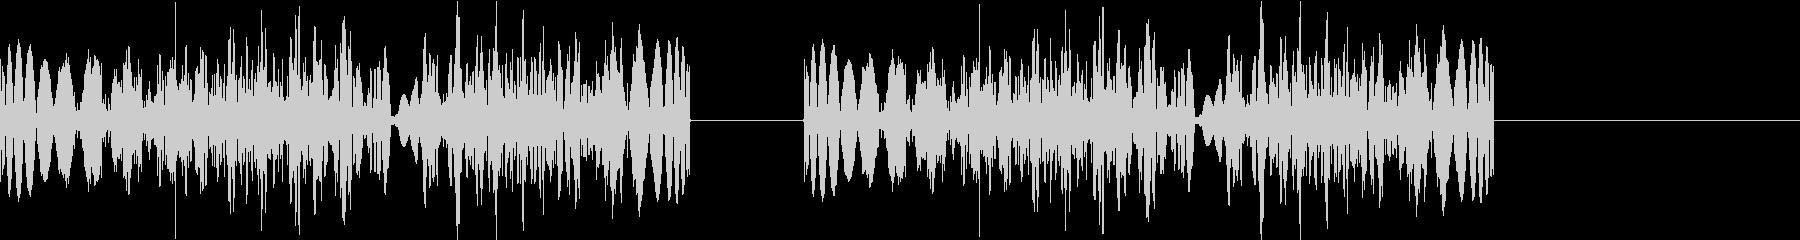 DJプレイ スクラッチ・ノイズ 309の未再生の波形